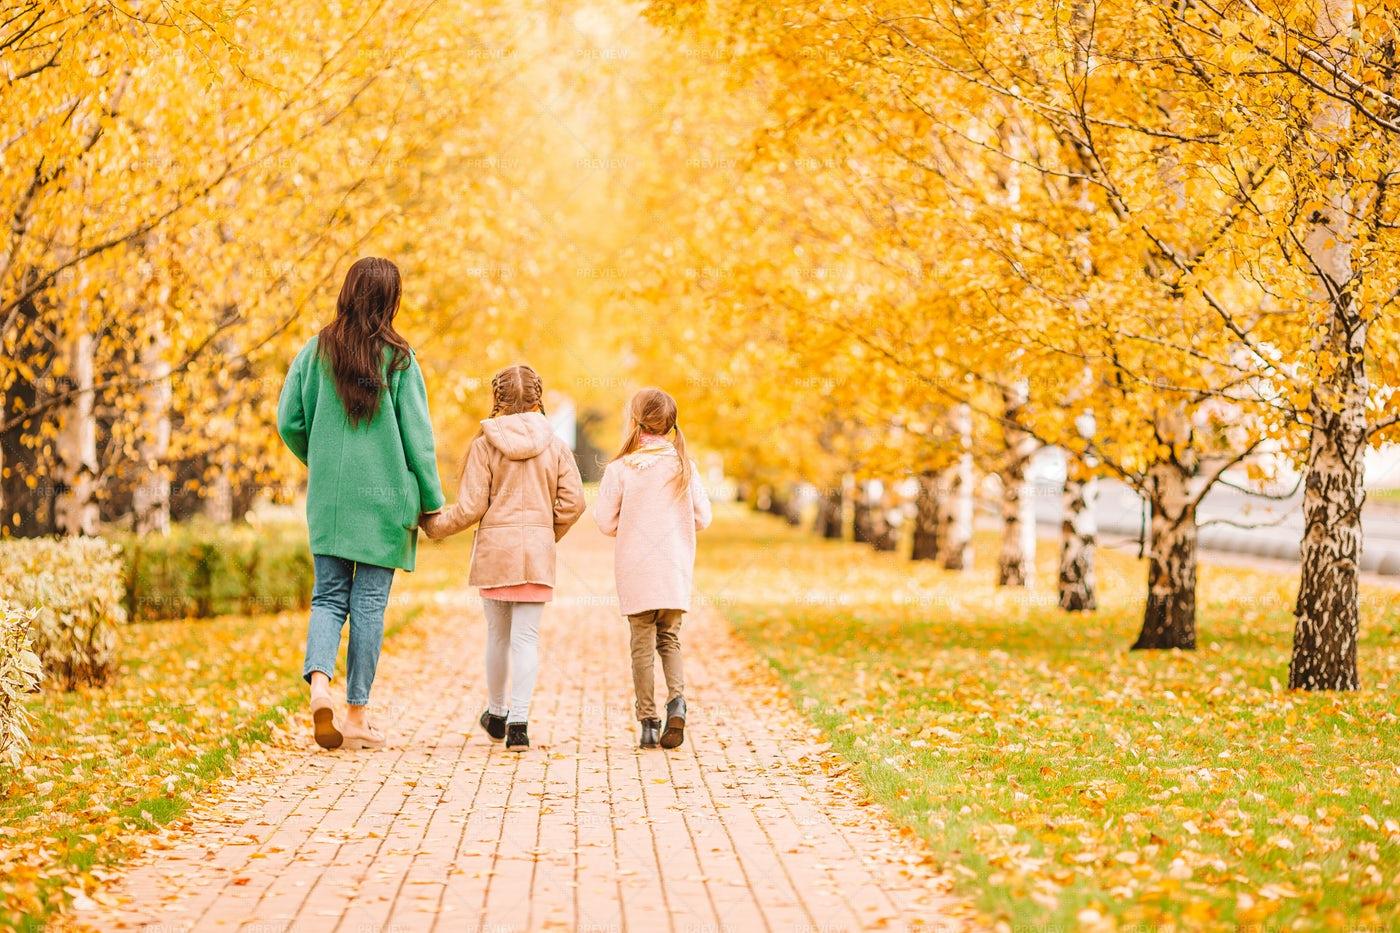 Walking Through Park With Mom: Stock Photos